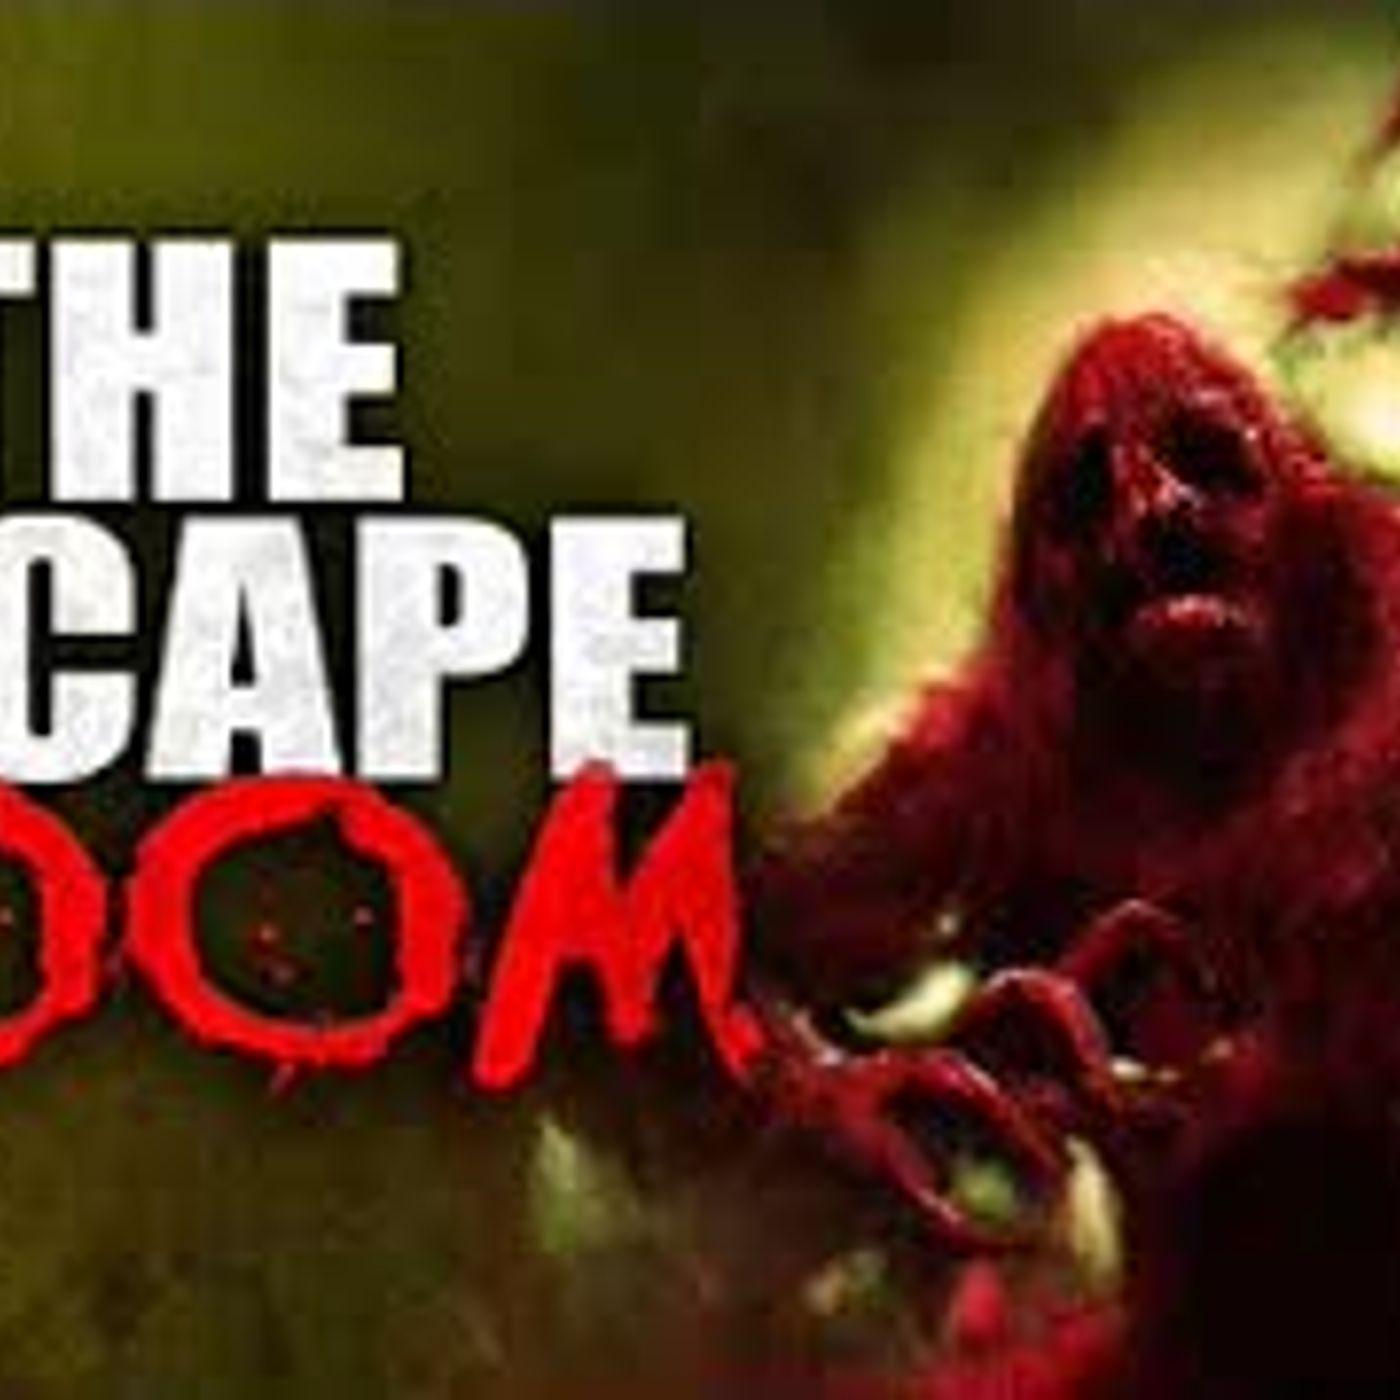 """The Escape Room"" Creepypasta"